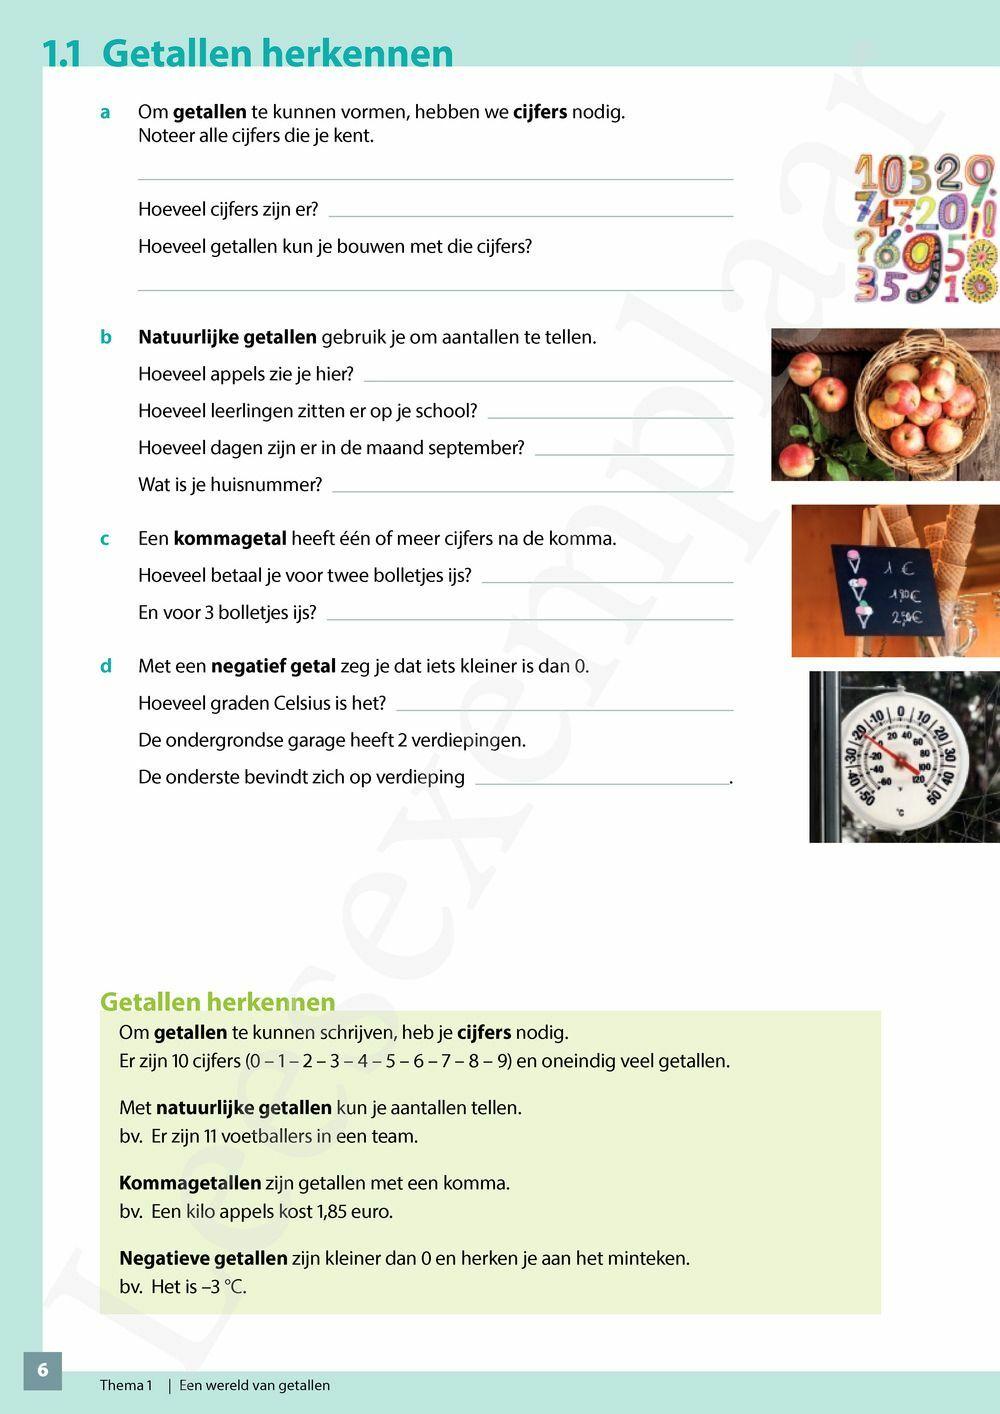 Preview: Wiskunde Concreet 1 leerwerkboek (inclusief Pelckmans Portaal)